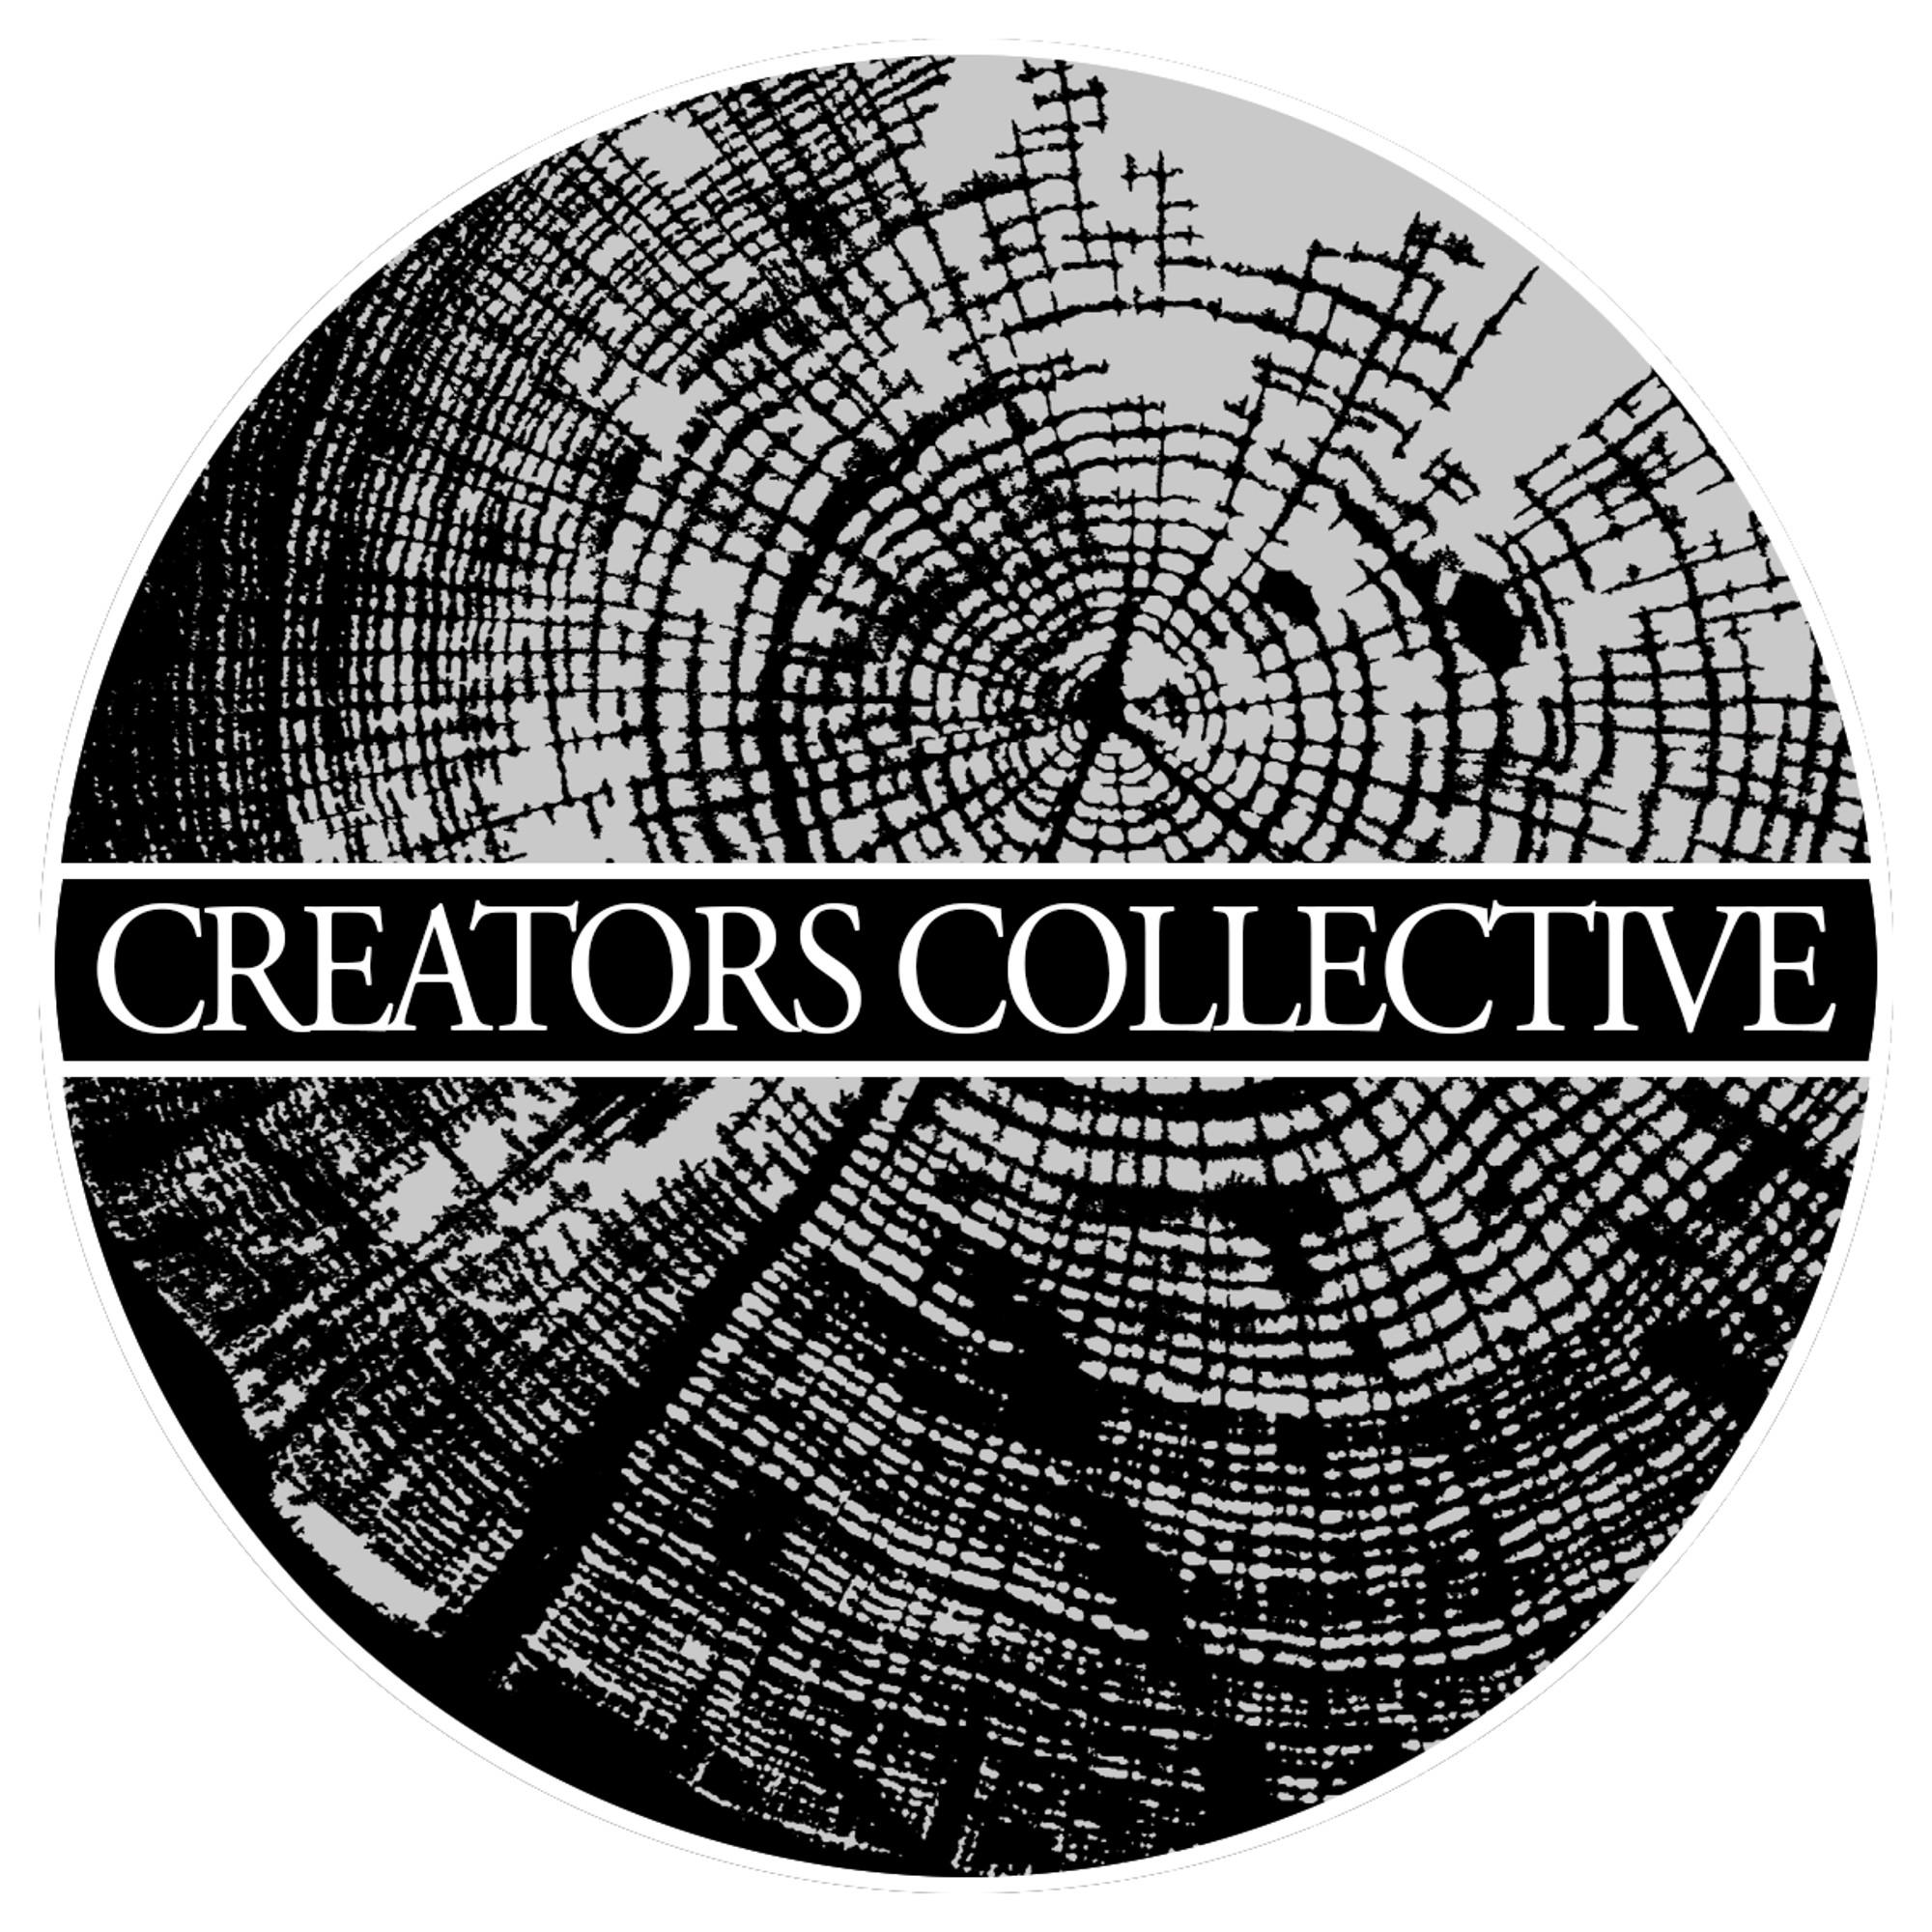 Creative colective big.jpg